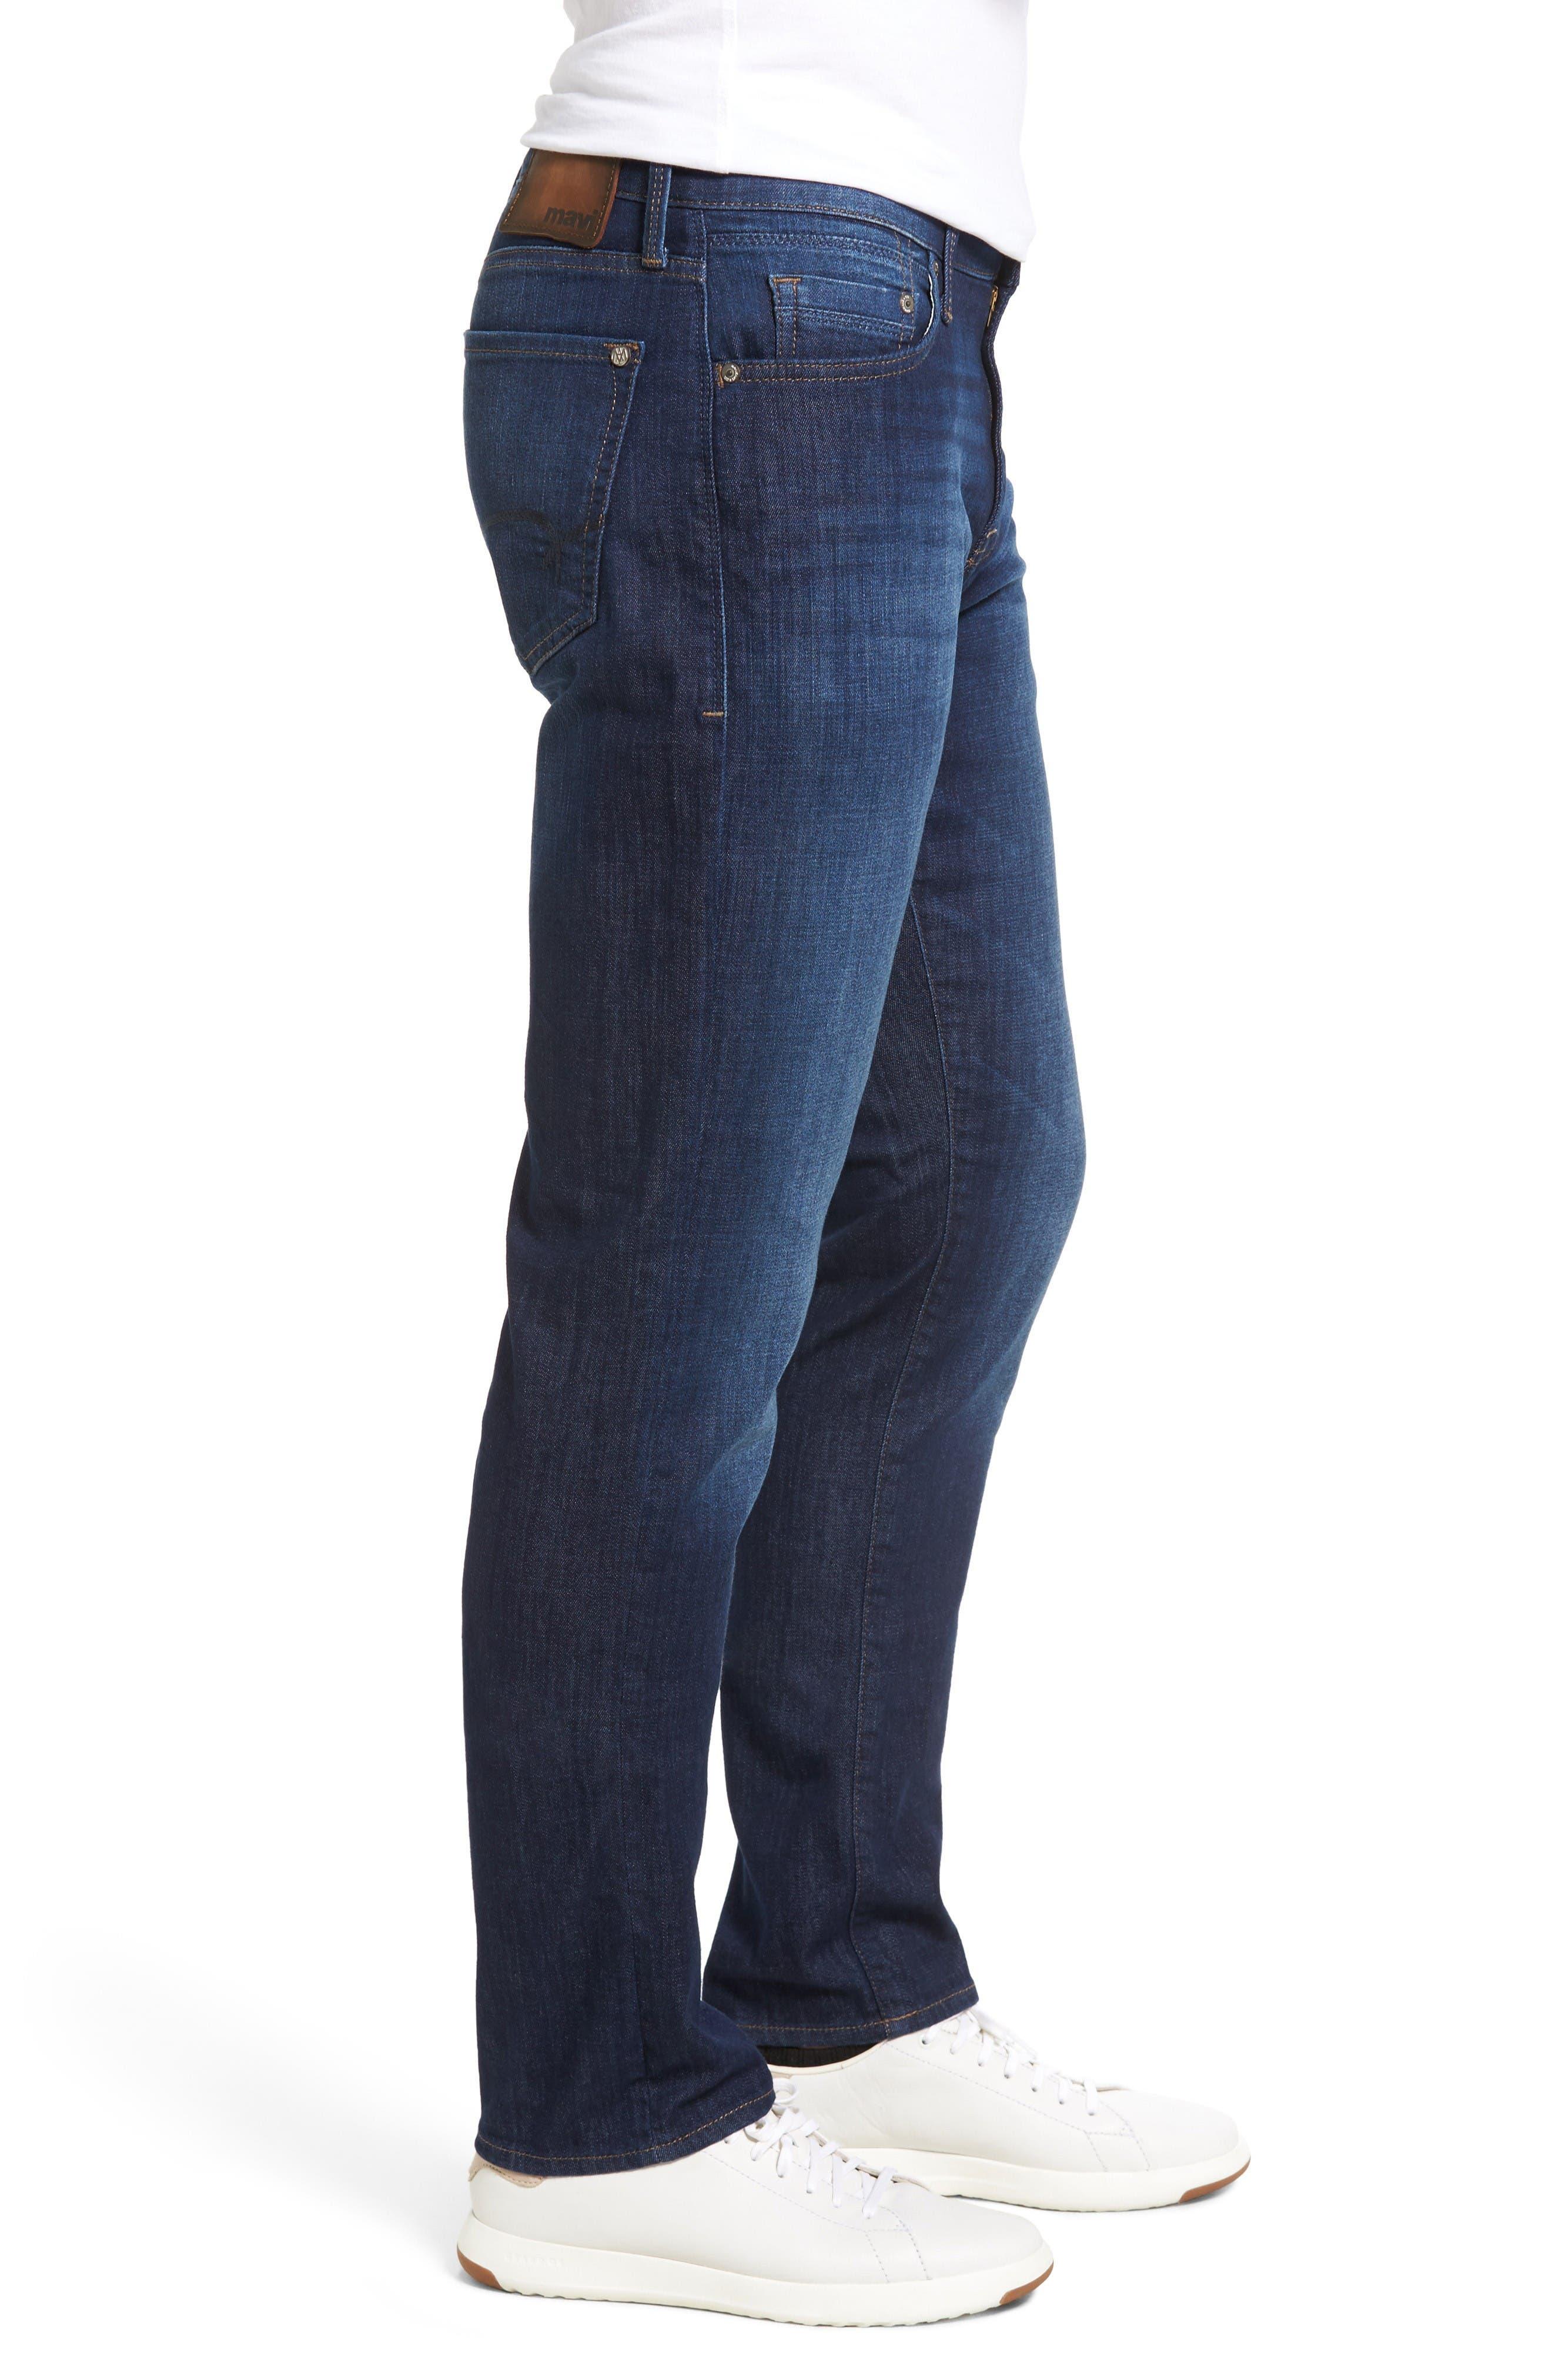 Marcus Slim Straight Leg Jeans,                             Alternate thumbnail 3, color,                             Indigo Portland